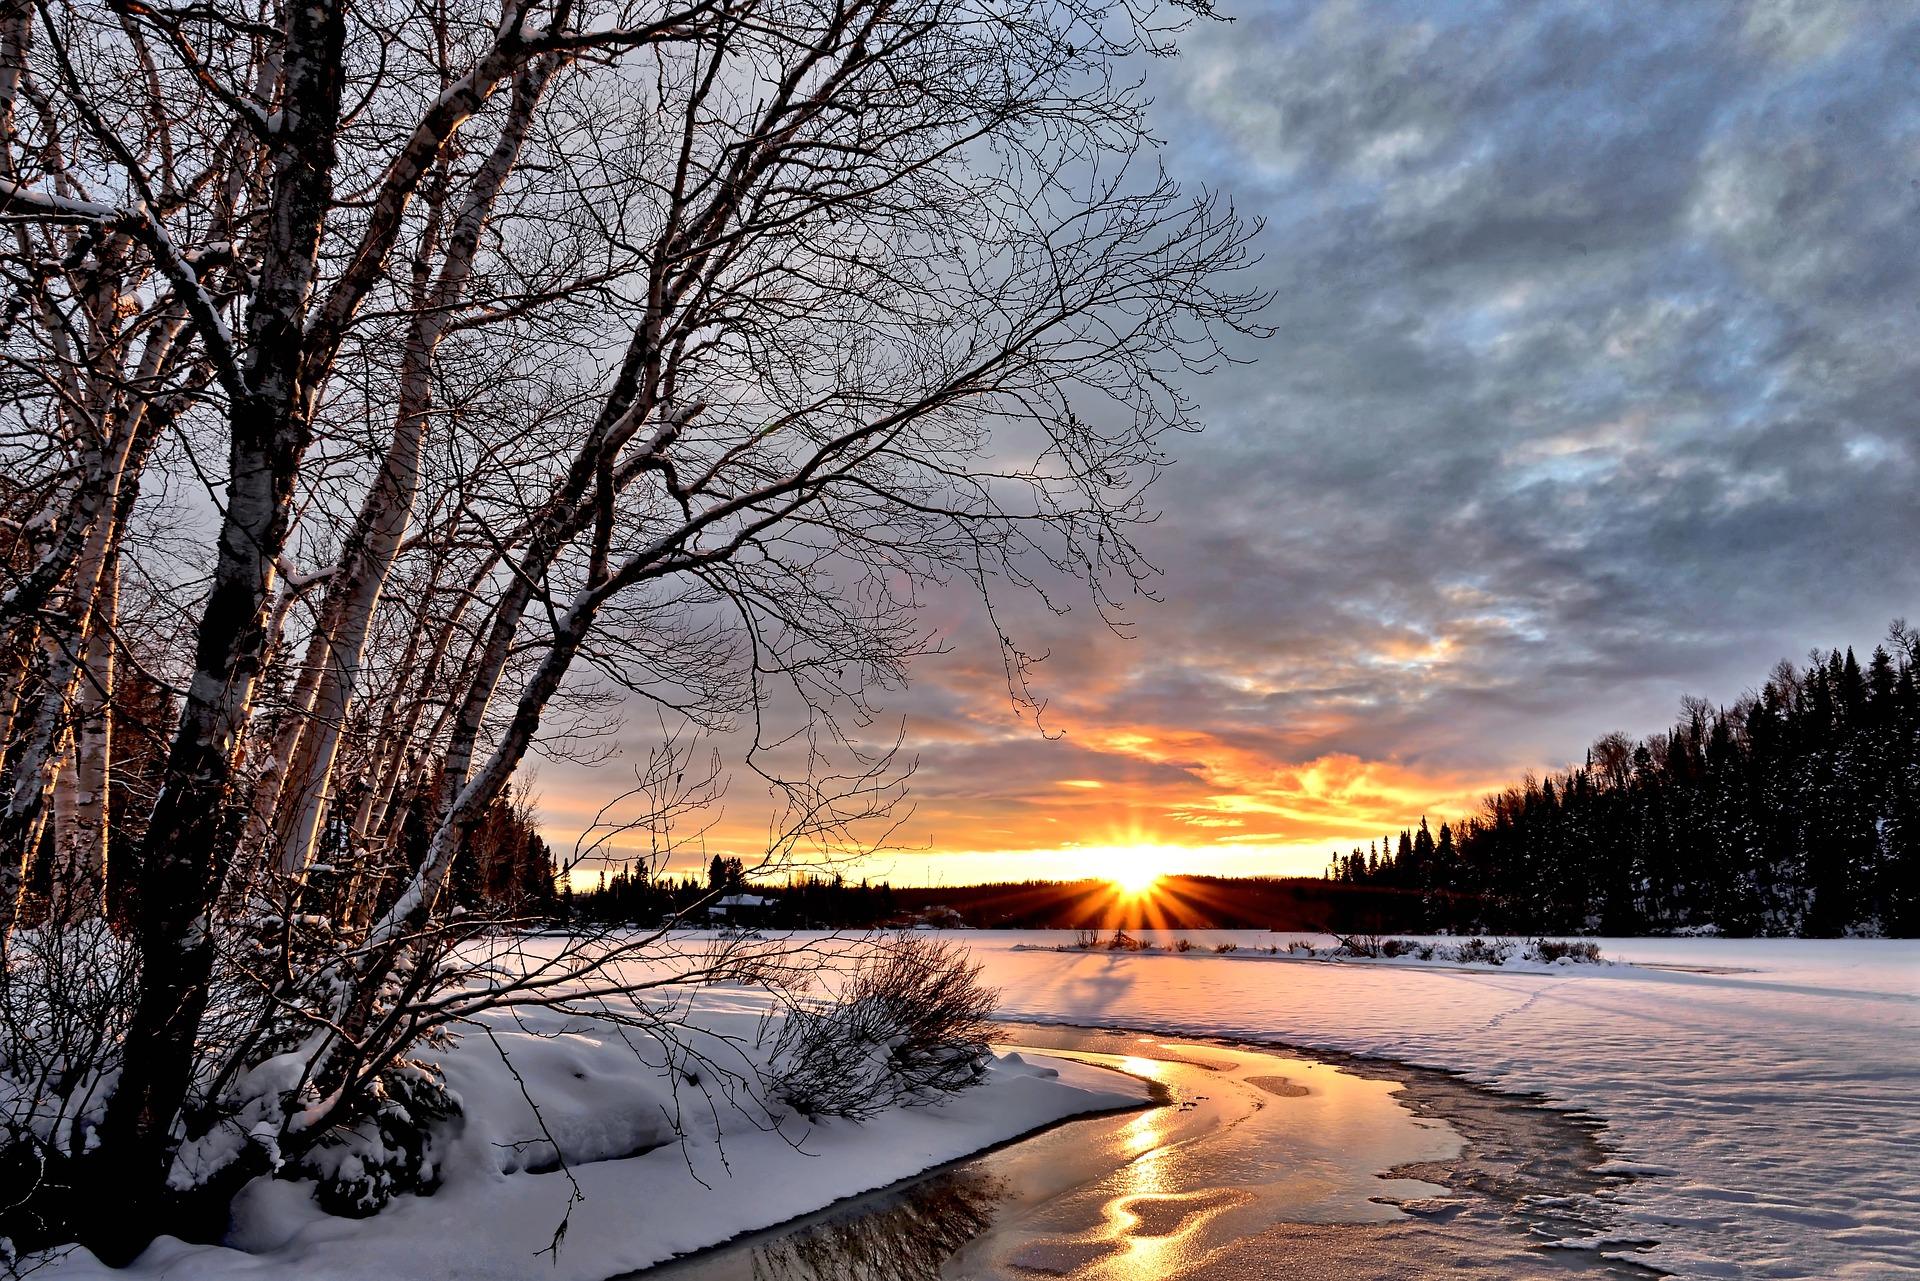 winter-landscape-2995987_1920 (1)